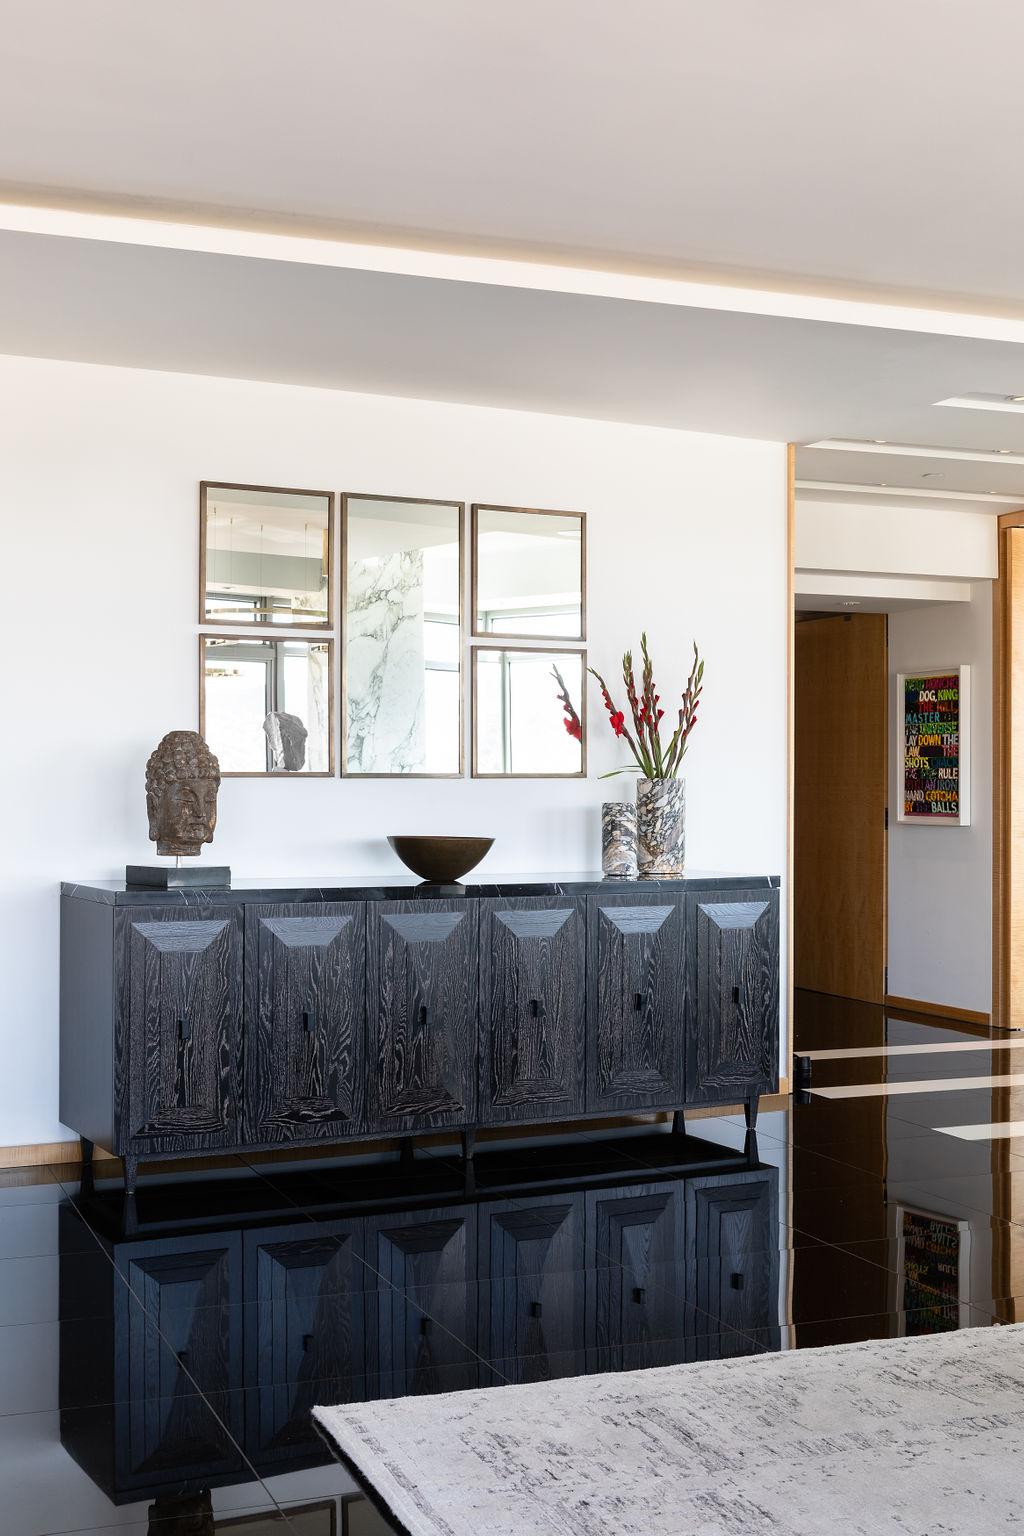 isaac-harte-designs-westwood-condo-11.jpg